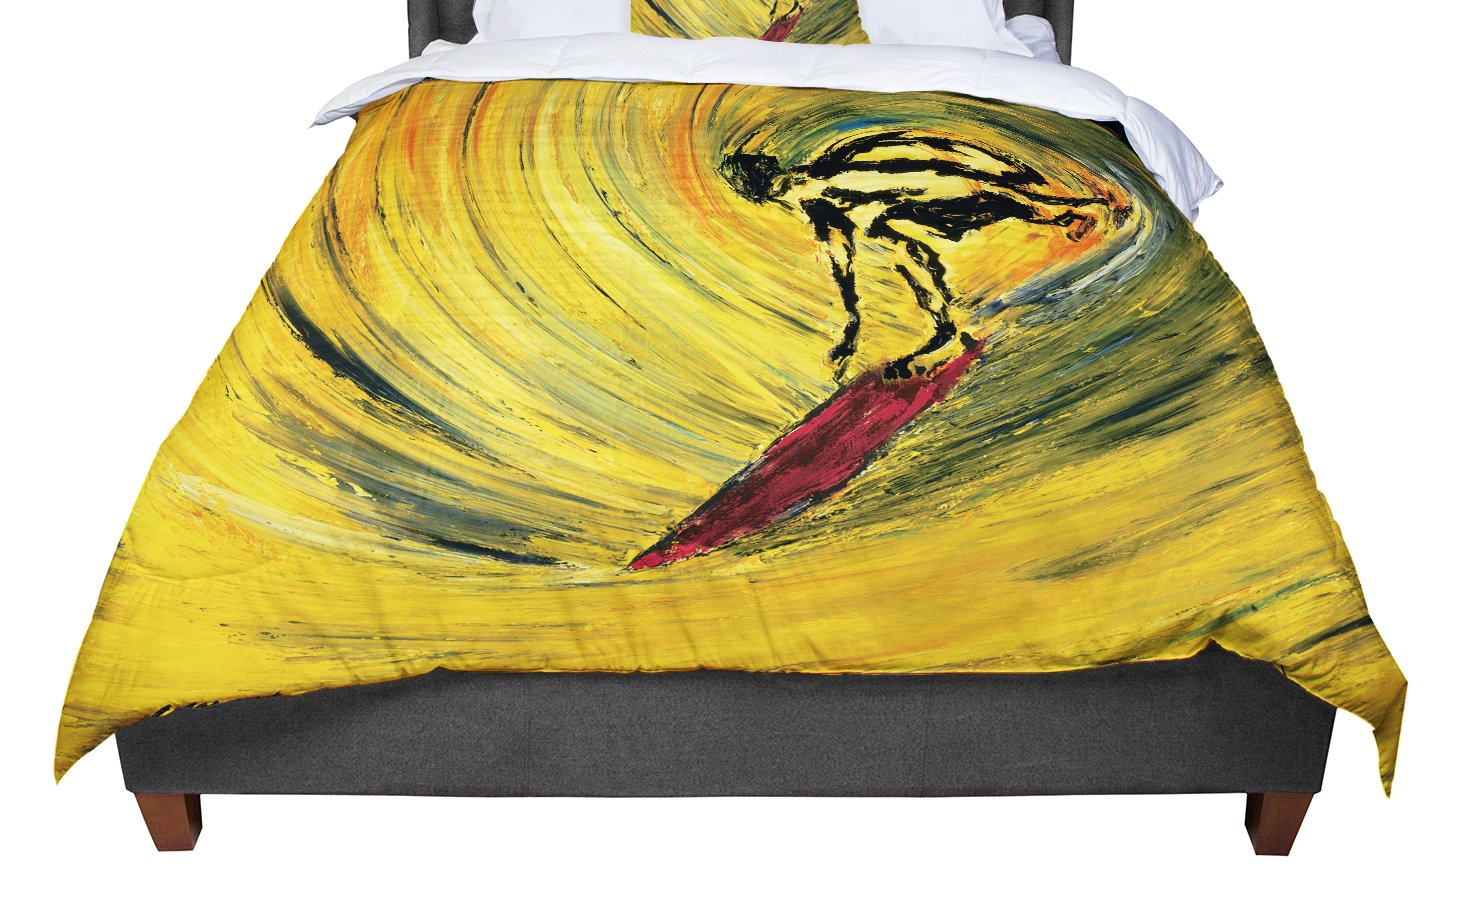 68 X 88 KESS InHouse Sylvia Cook Peacock Feather Twin Comforter